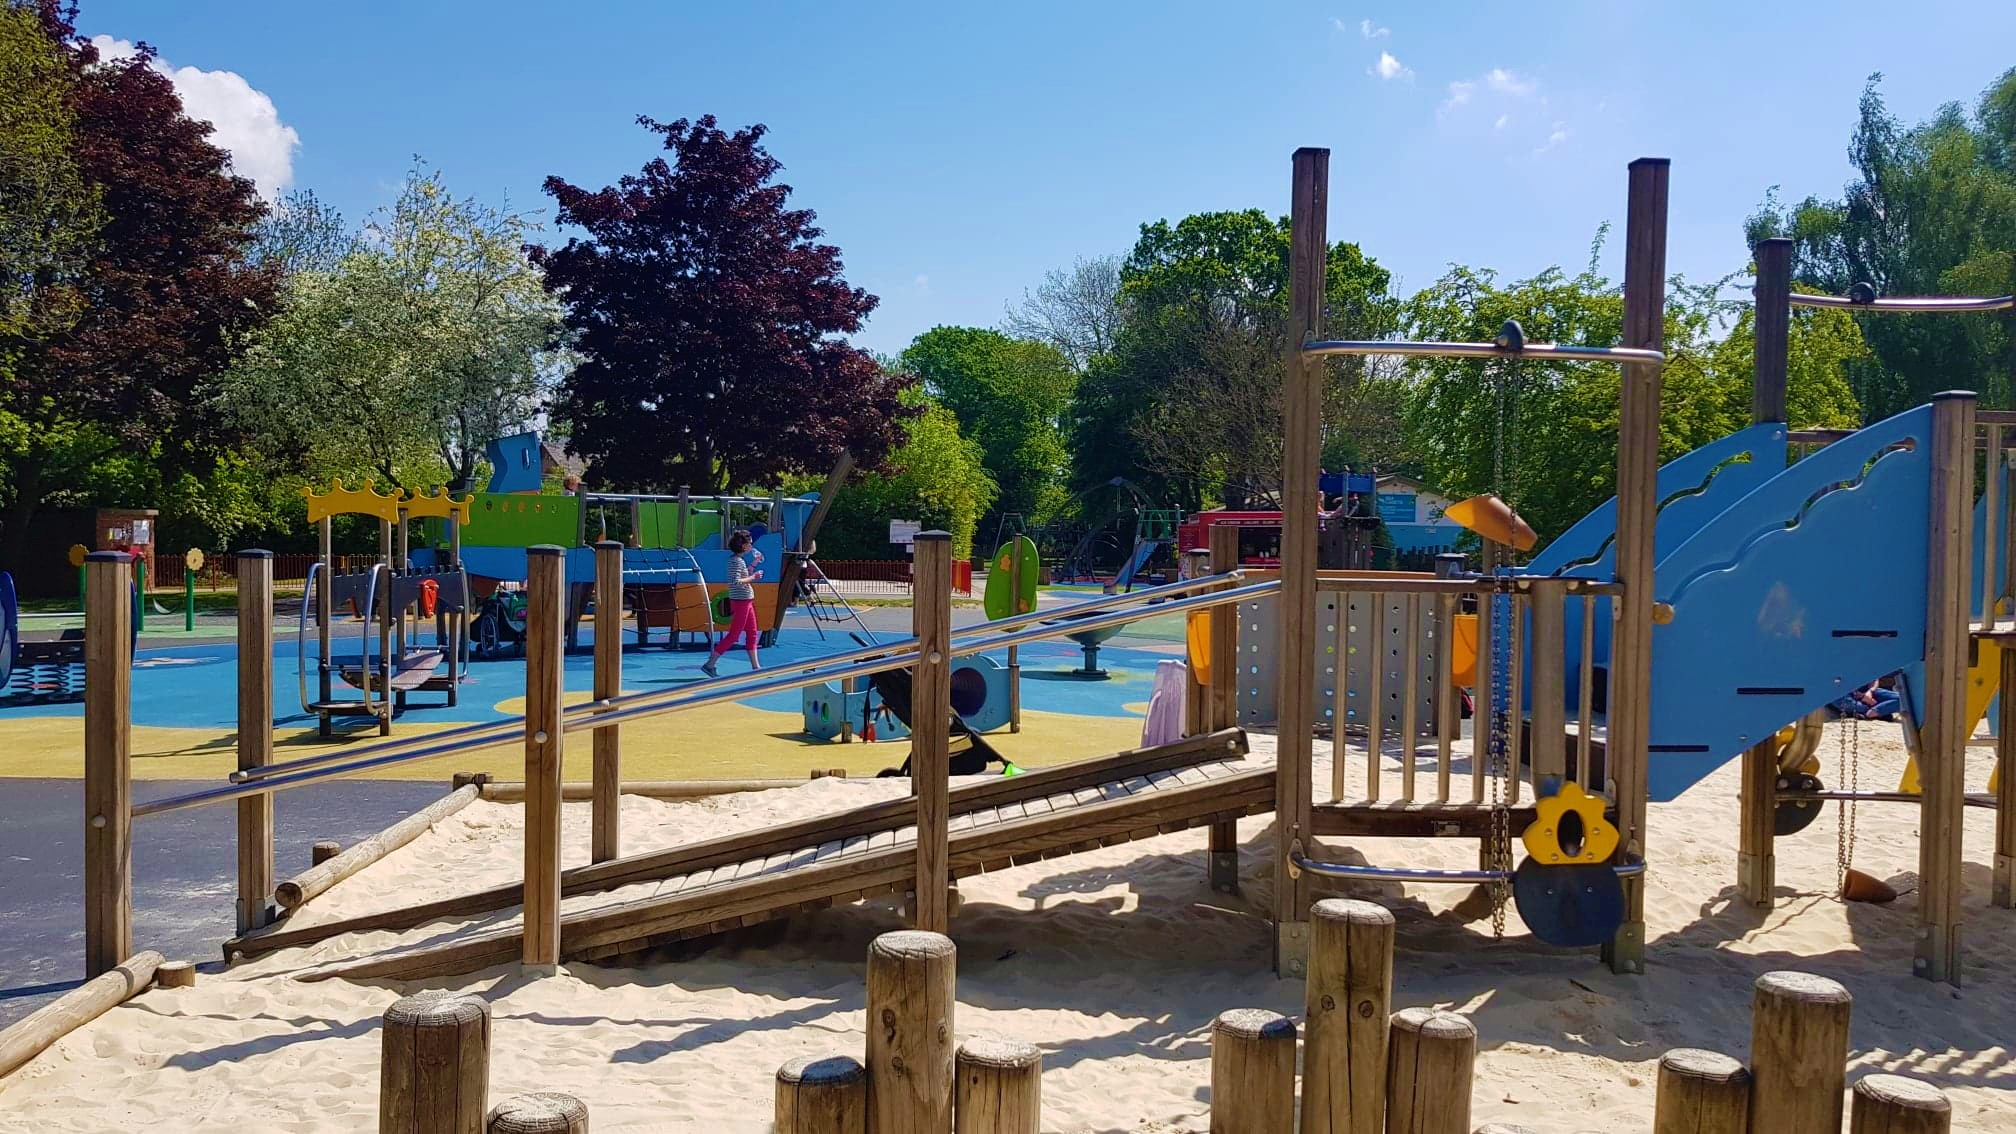 riverside play park Stradford-upon-avon